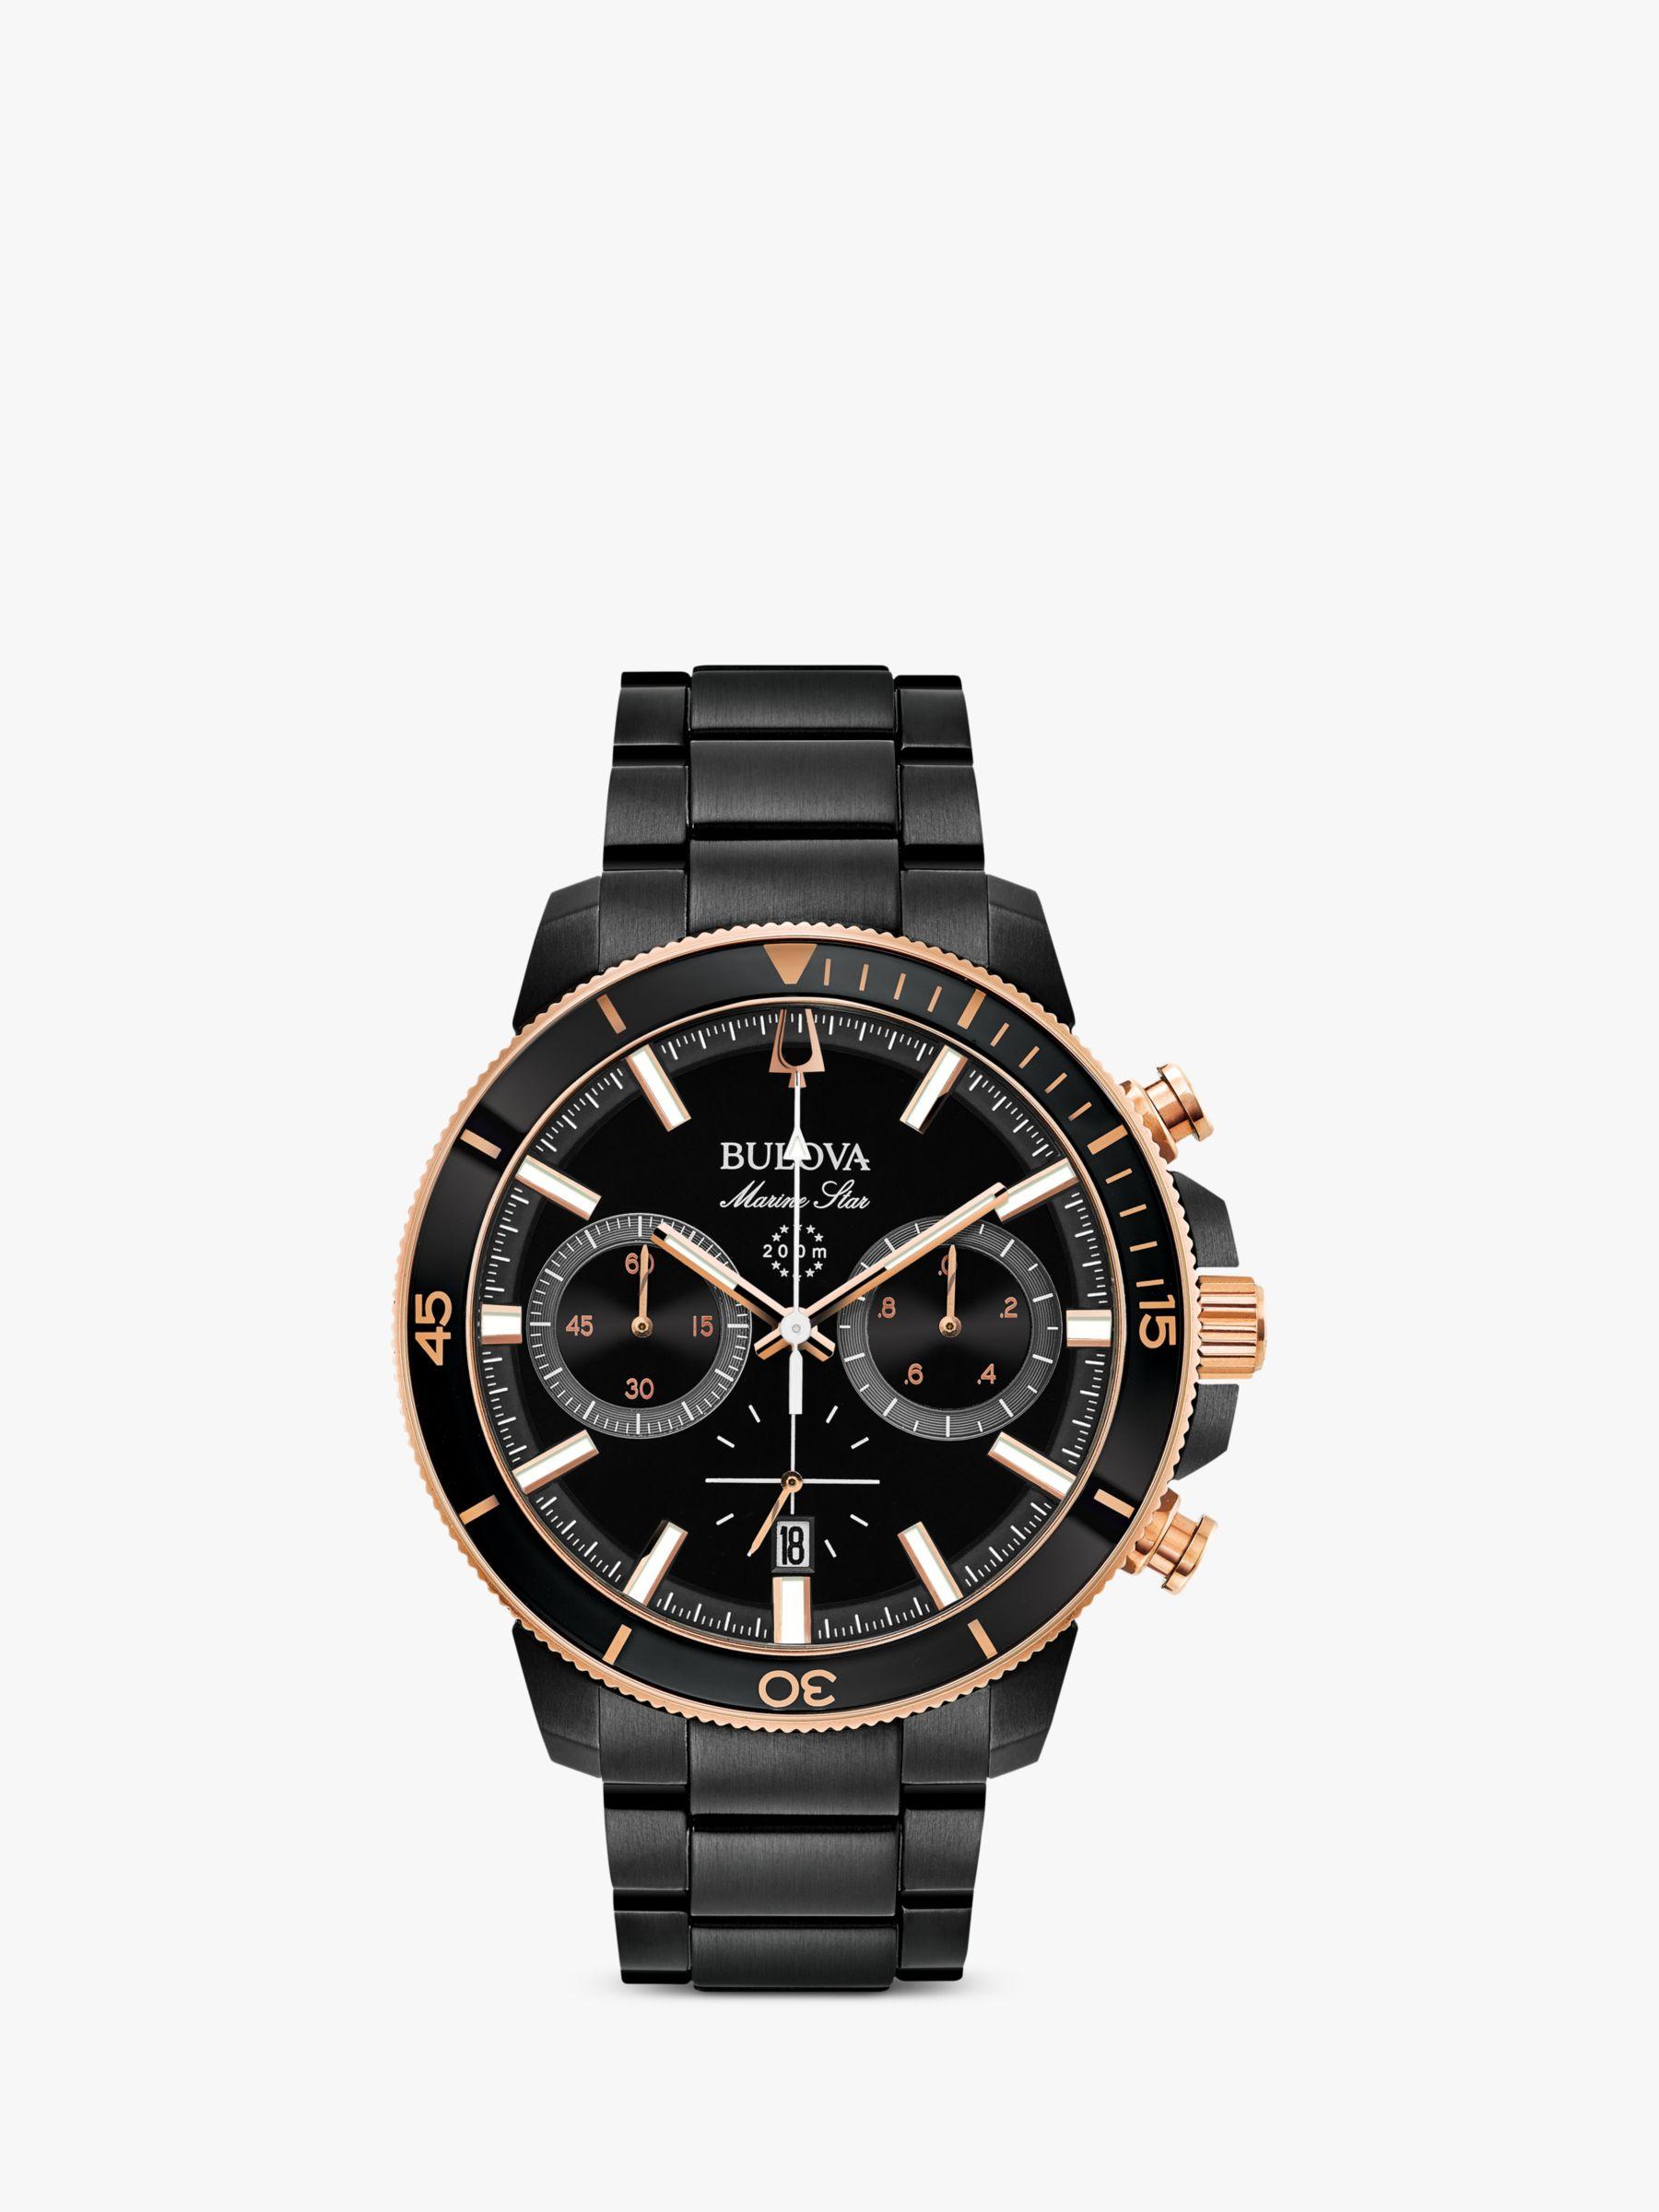 Bulova Bulova 98B302 Men's Marine Star Date Chronograph Bracelet Strap Watch, Black